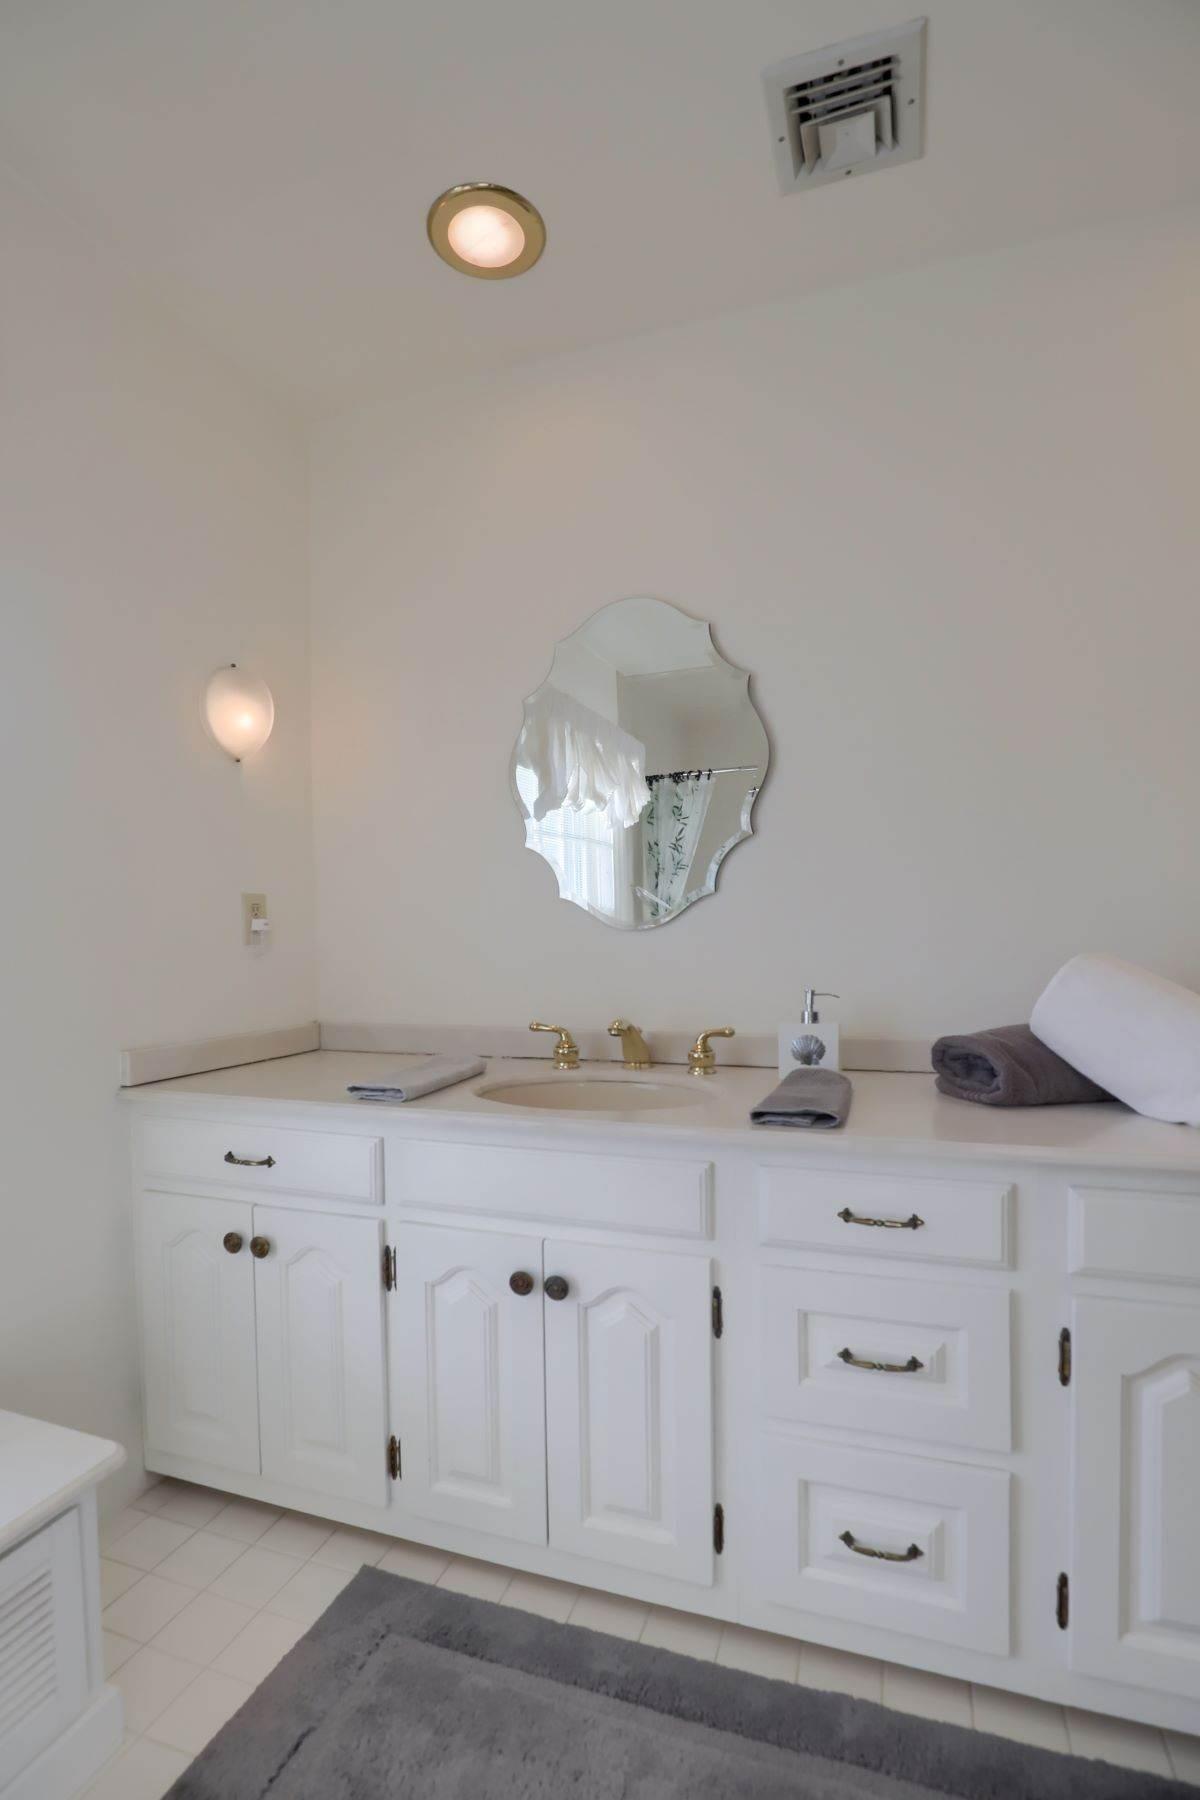 31. Single Family Homes for Sale at 206 E Granada Ave Hershey, Pennsylvania 17033 United States